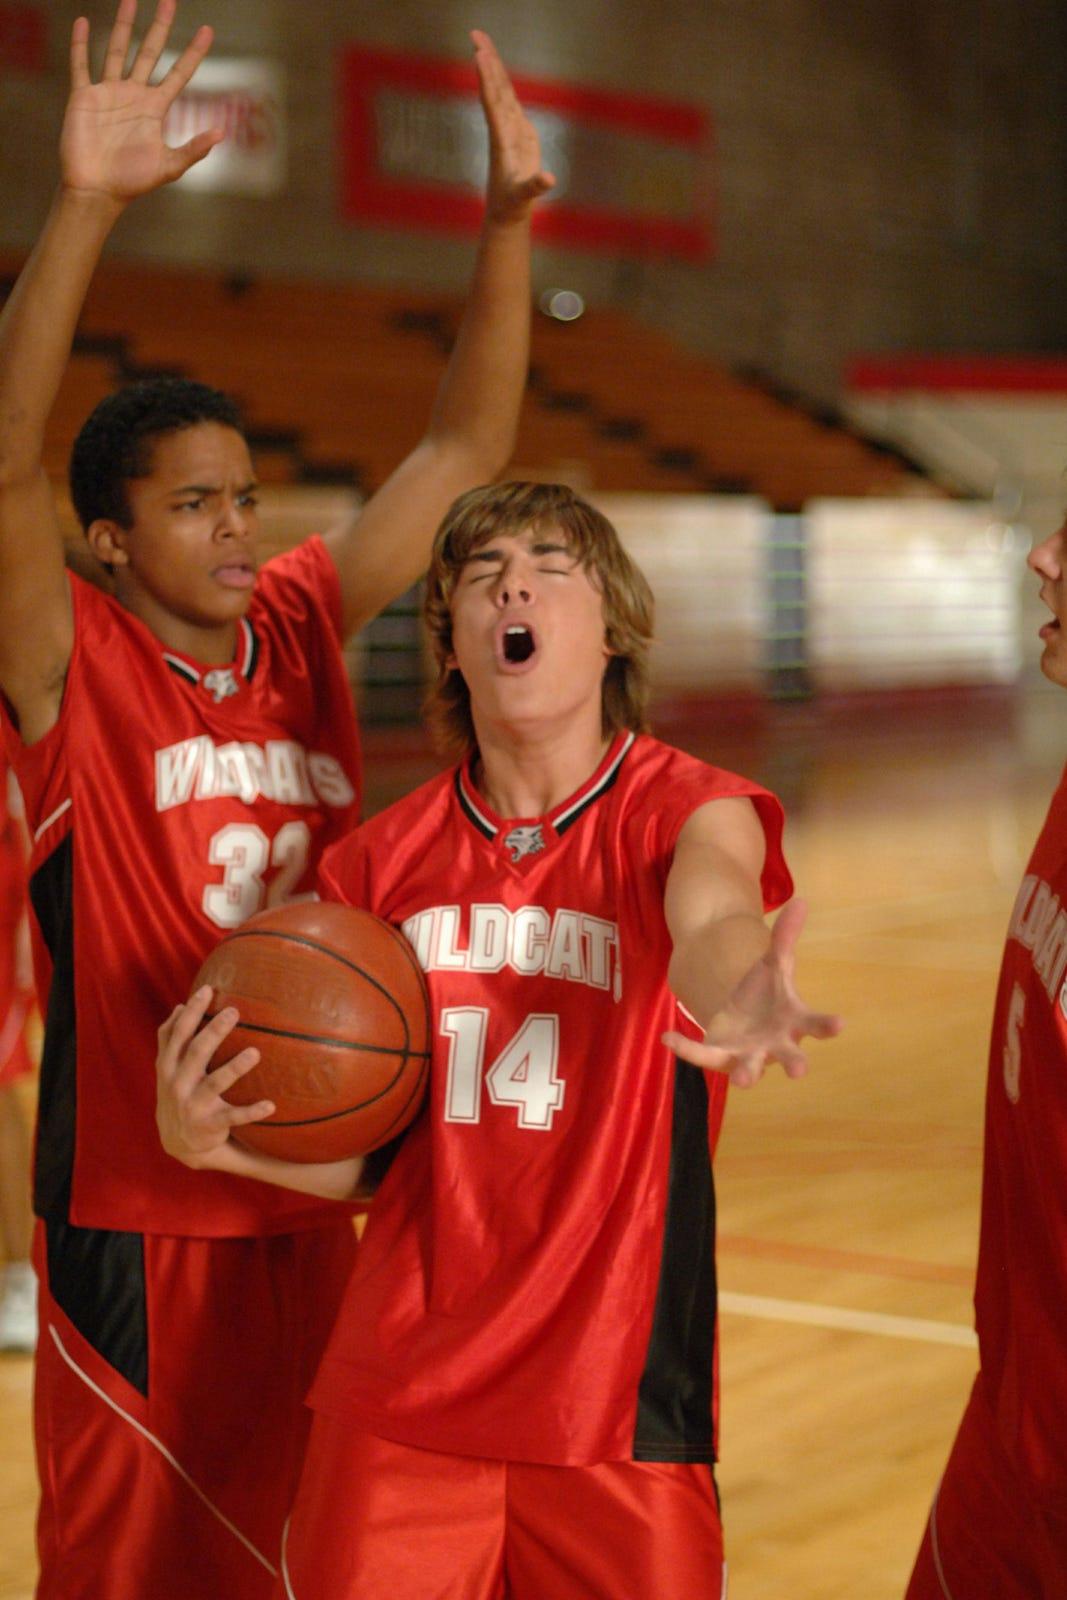 High School Musical Cast Where Are They Now, Zac Efron Zac Efron Imdb